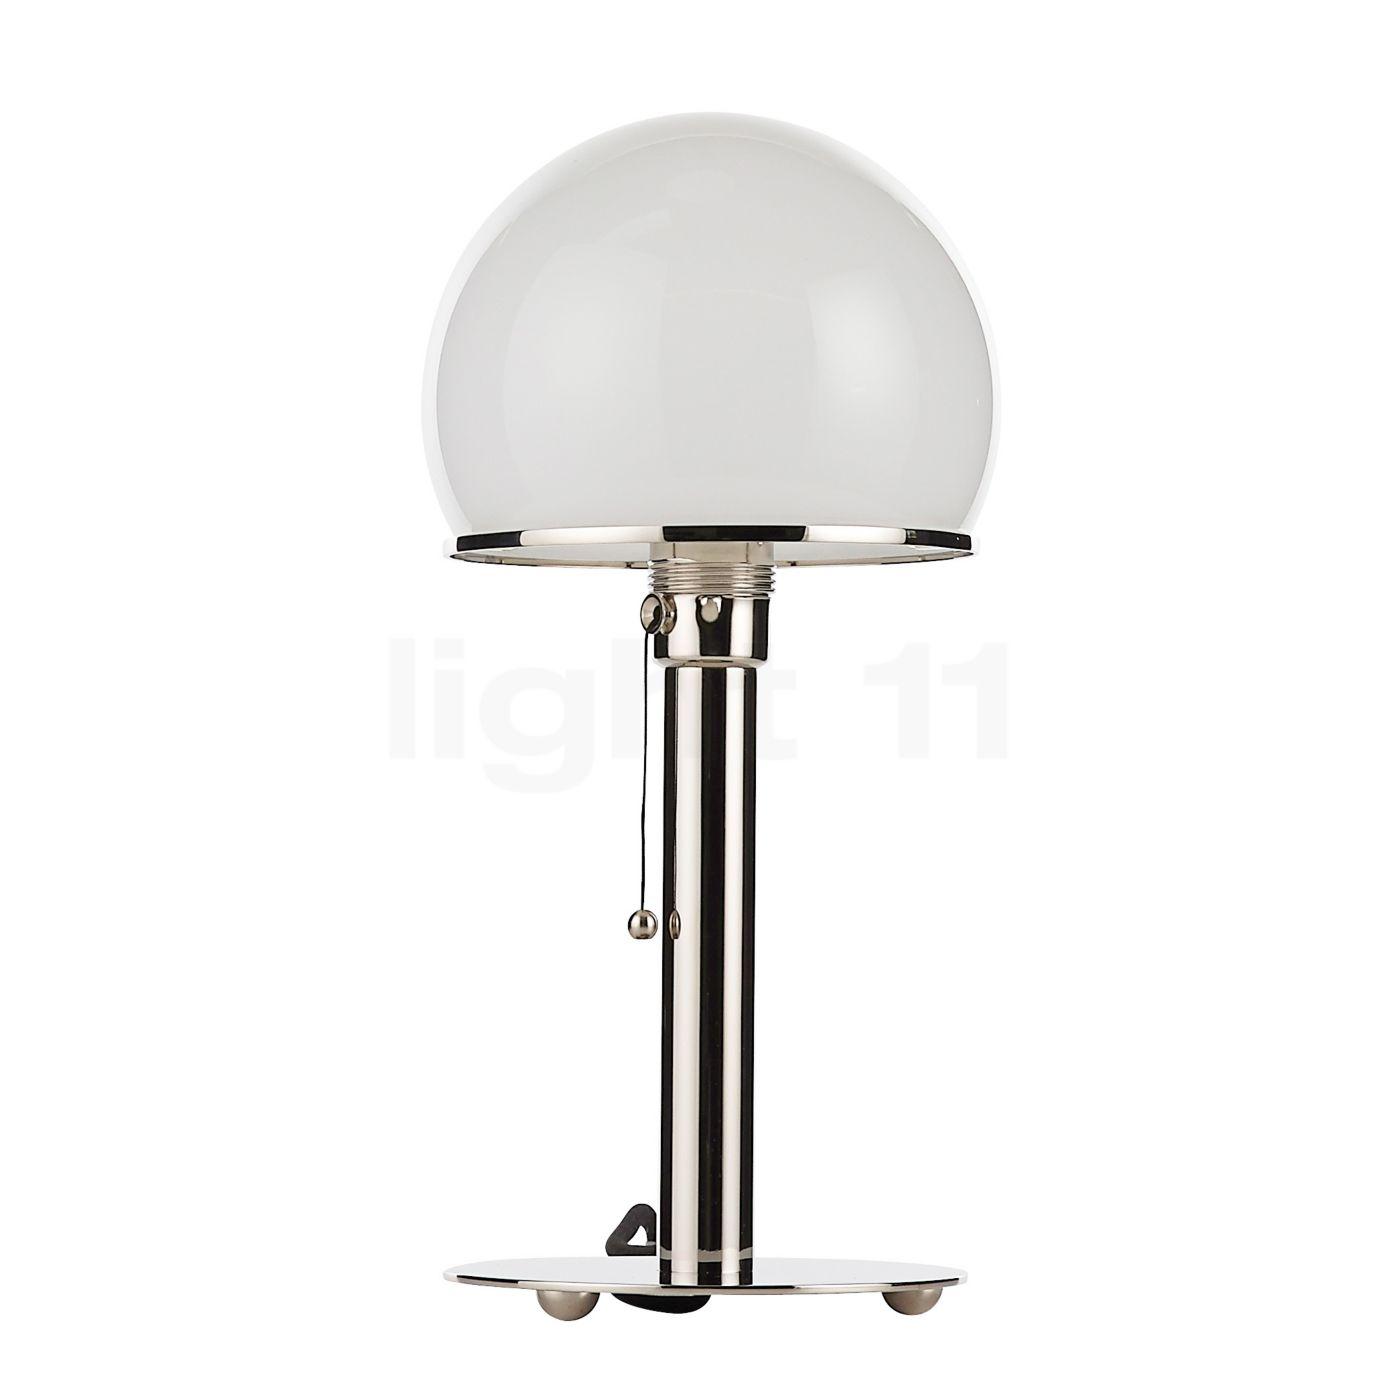 Buy tecnolumen spare parts footplate for wagenfeld wg24 and wg 25 gl buy tecnolumen spare parts footplate for wagenfeld wg24 and wg 25 gl table lamp at aloadofball Gallery